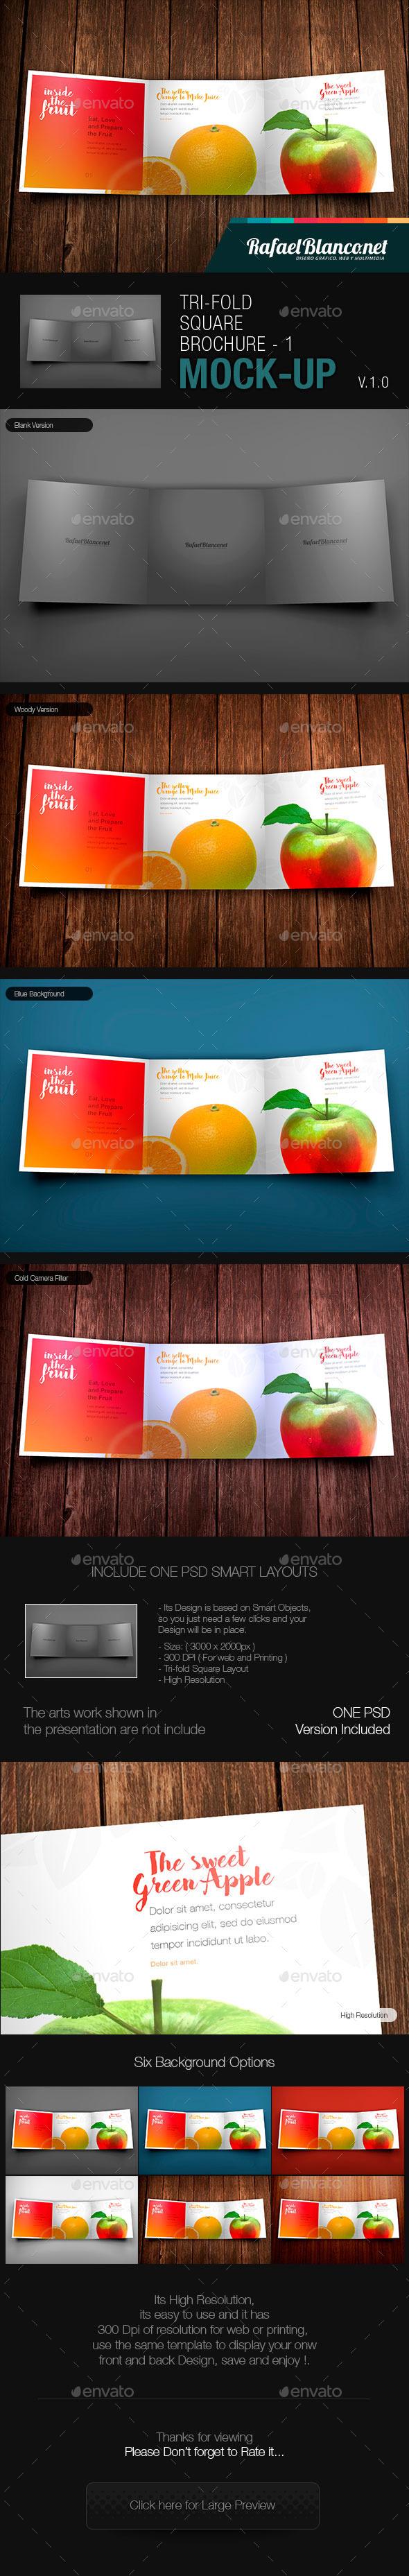 Tri-Fold Square Brochure Mock-up - 1 - Brochures Print